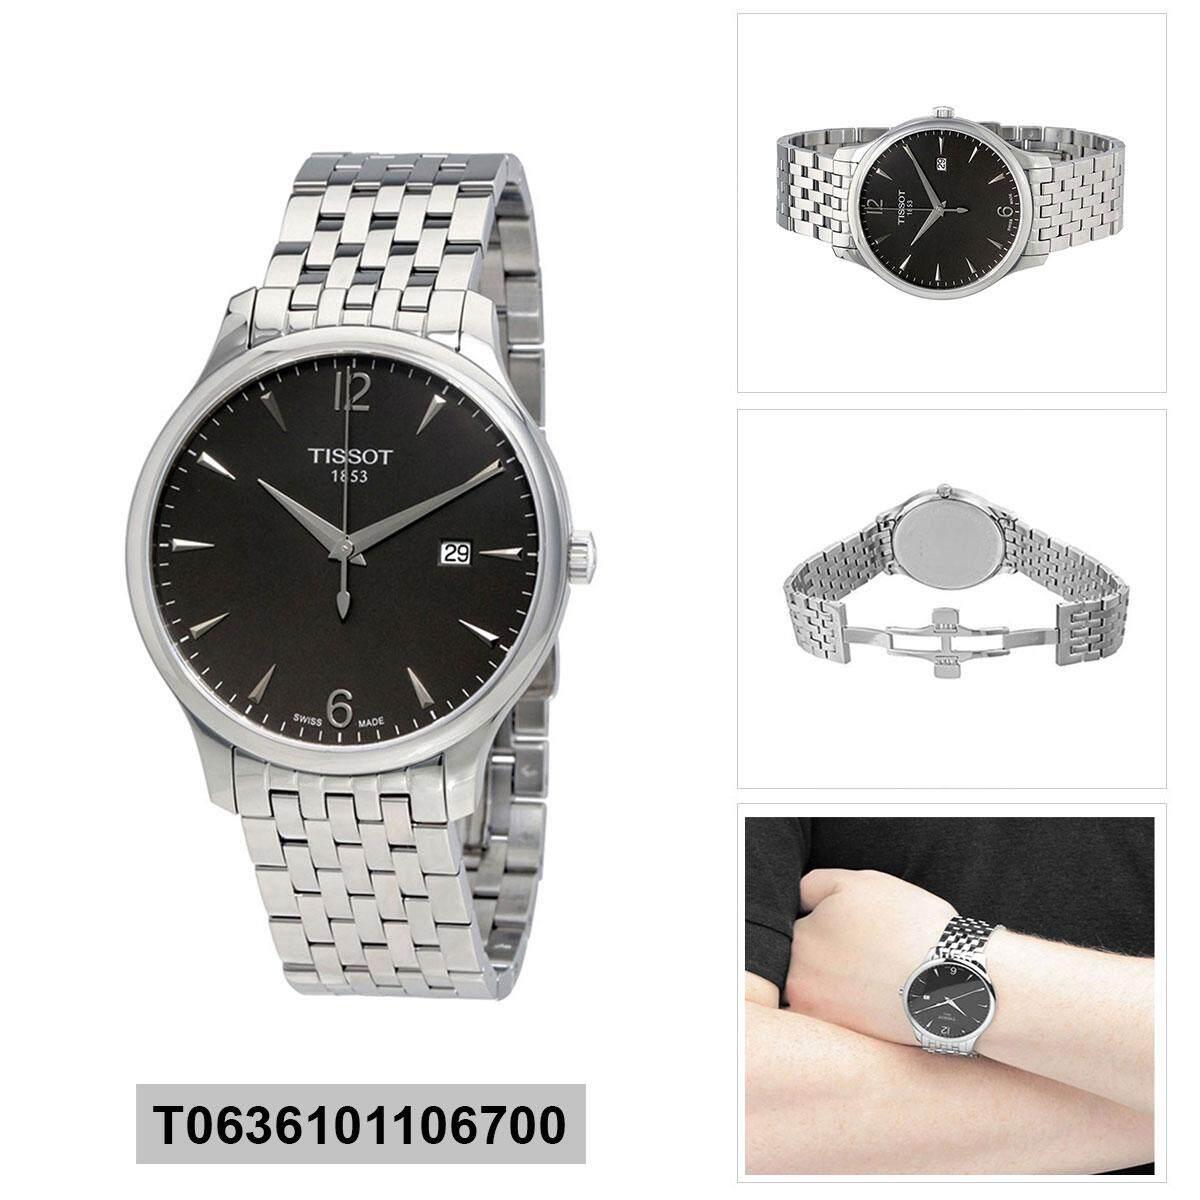 Sell Tissot Mens T062 Cheapest Best Quality Th Store Prc 200 T0554301105700 Black Thb 6990